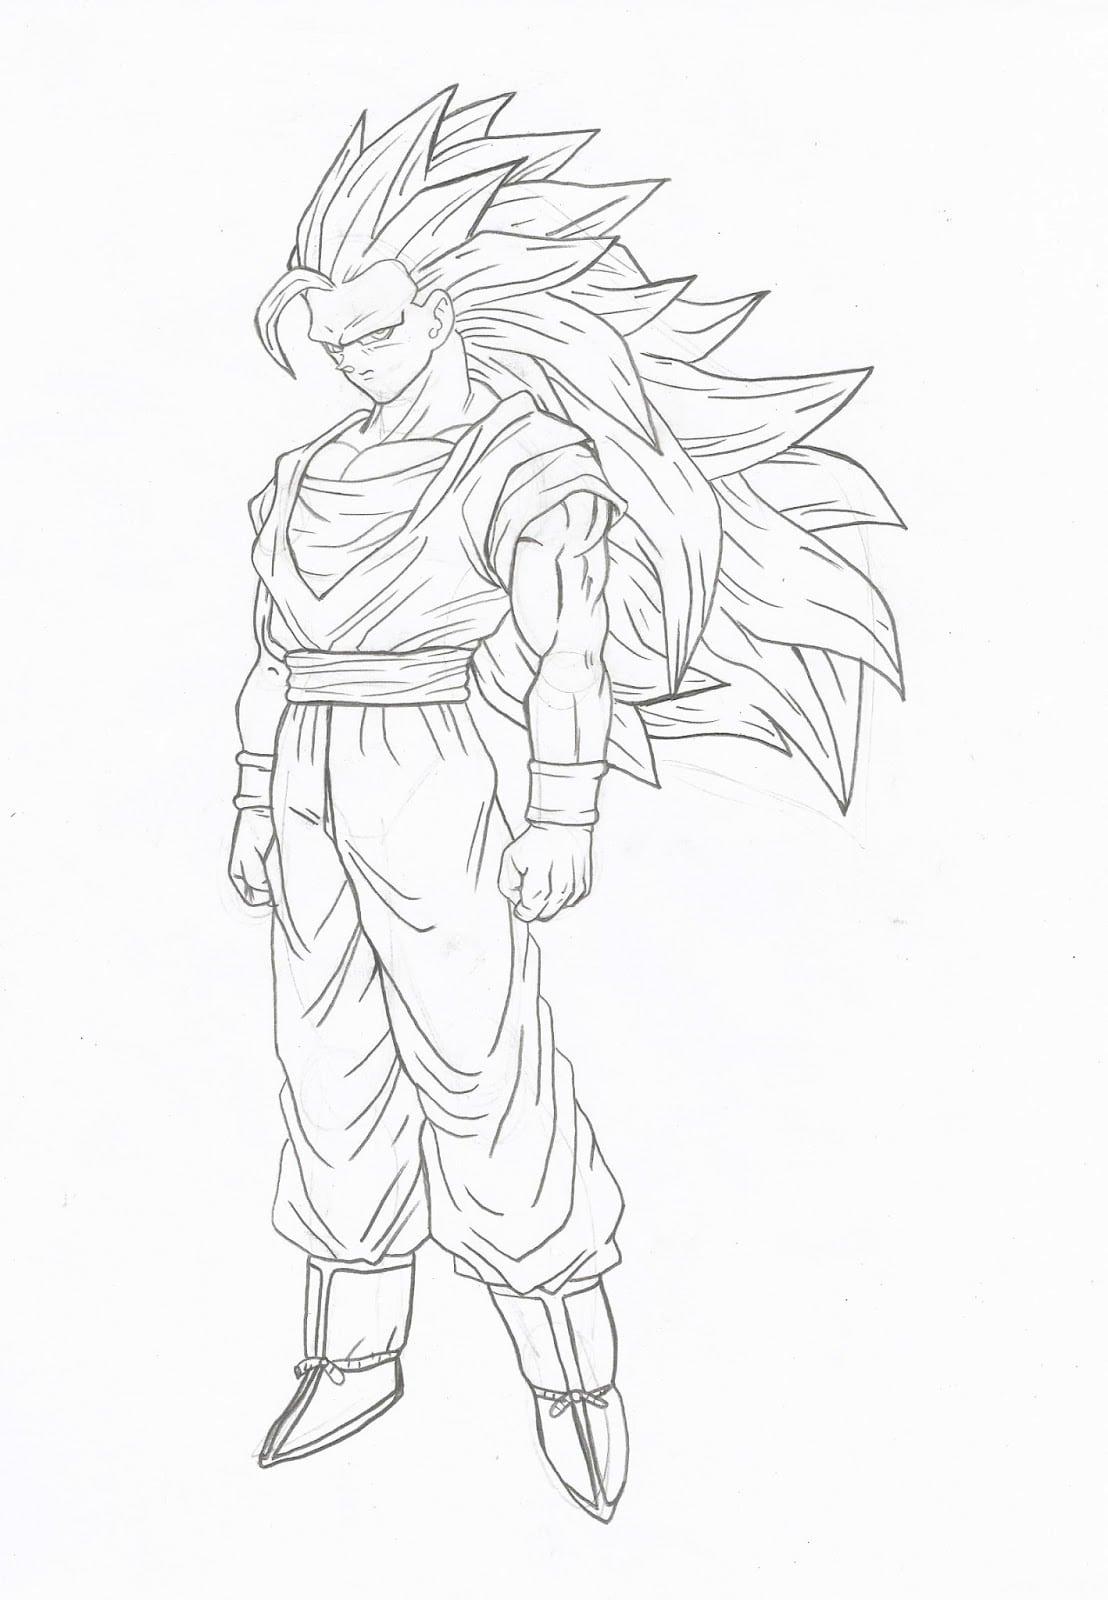 Como Desenhar Goku Super Sayajin 3